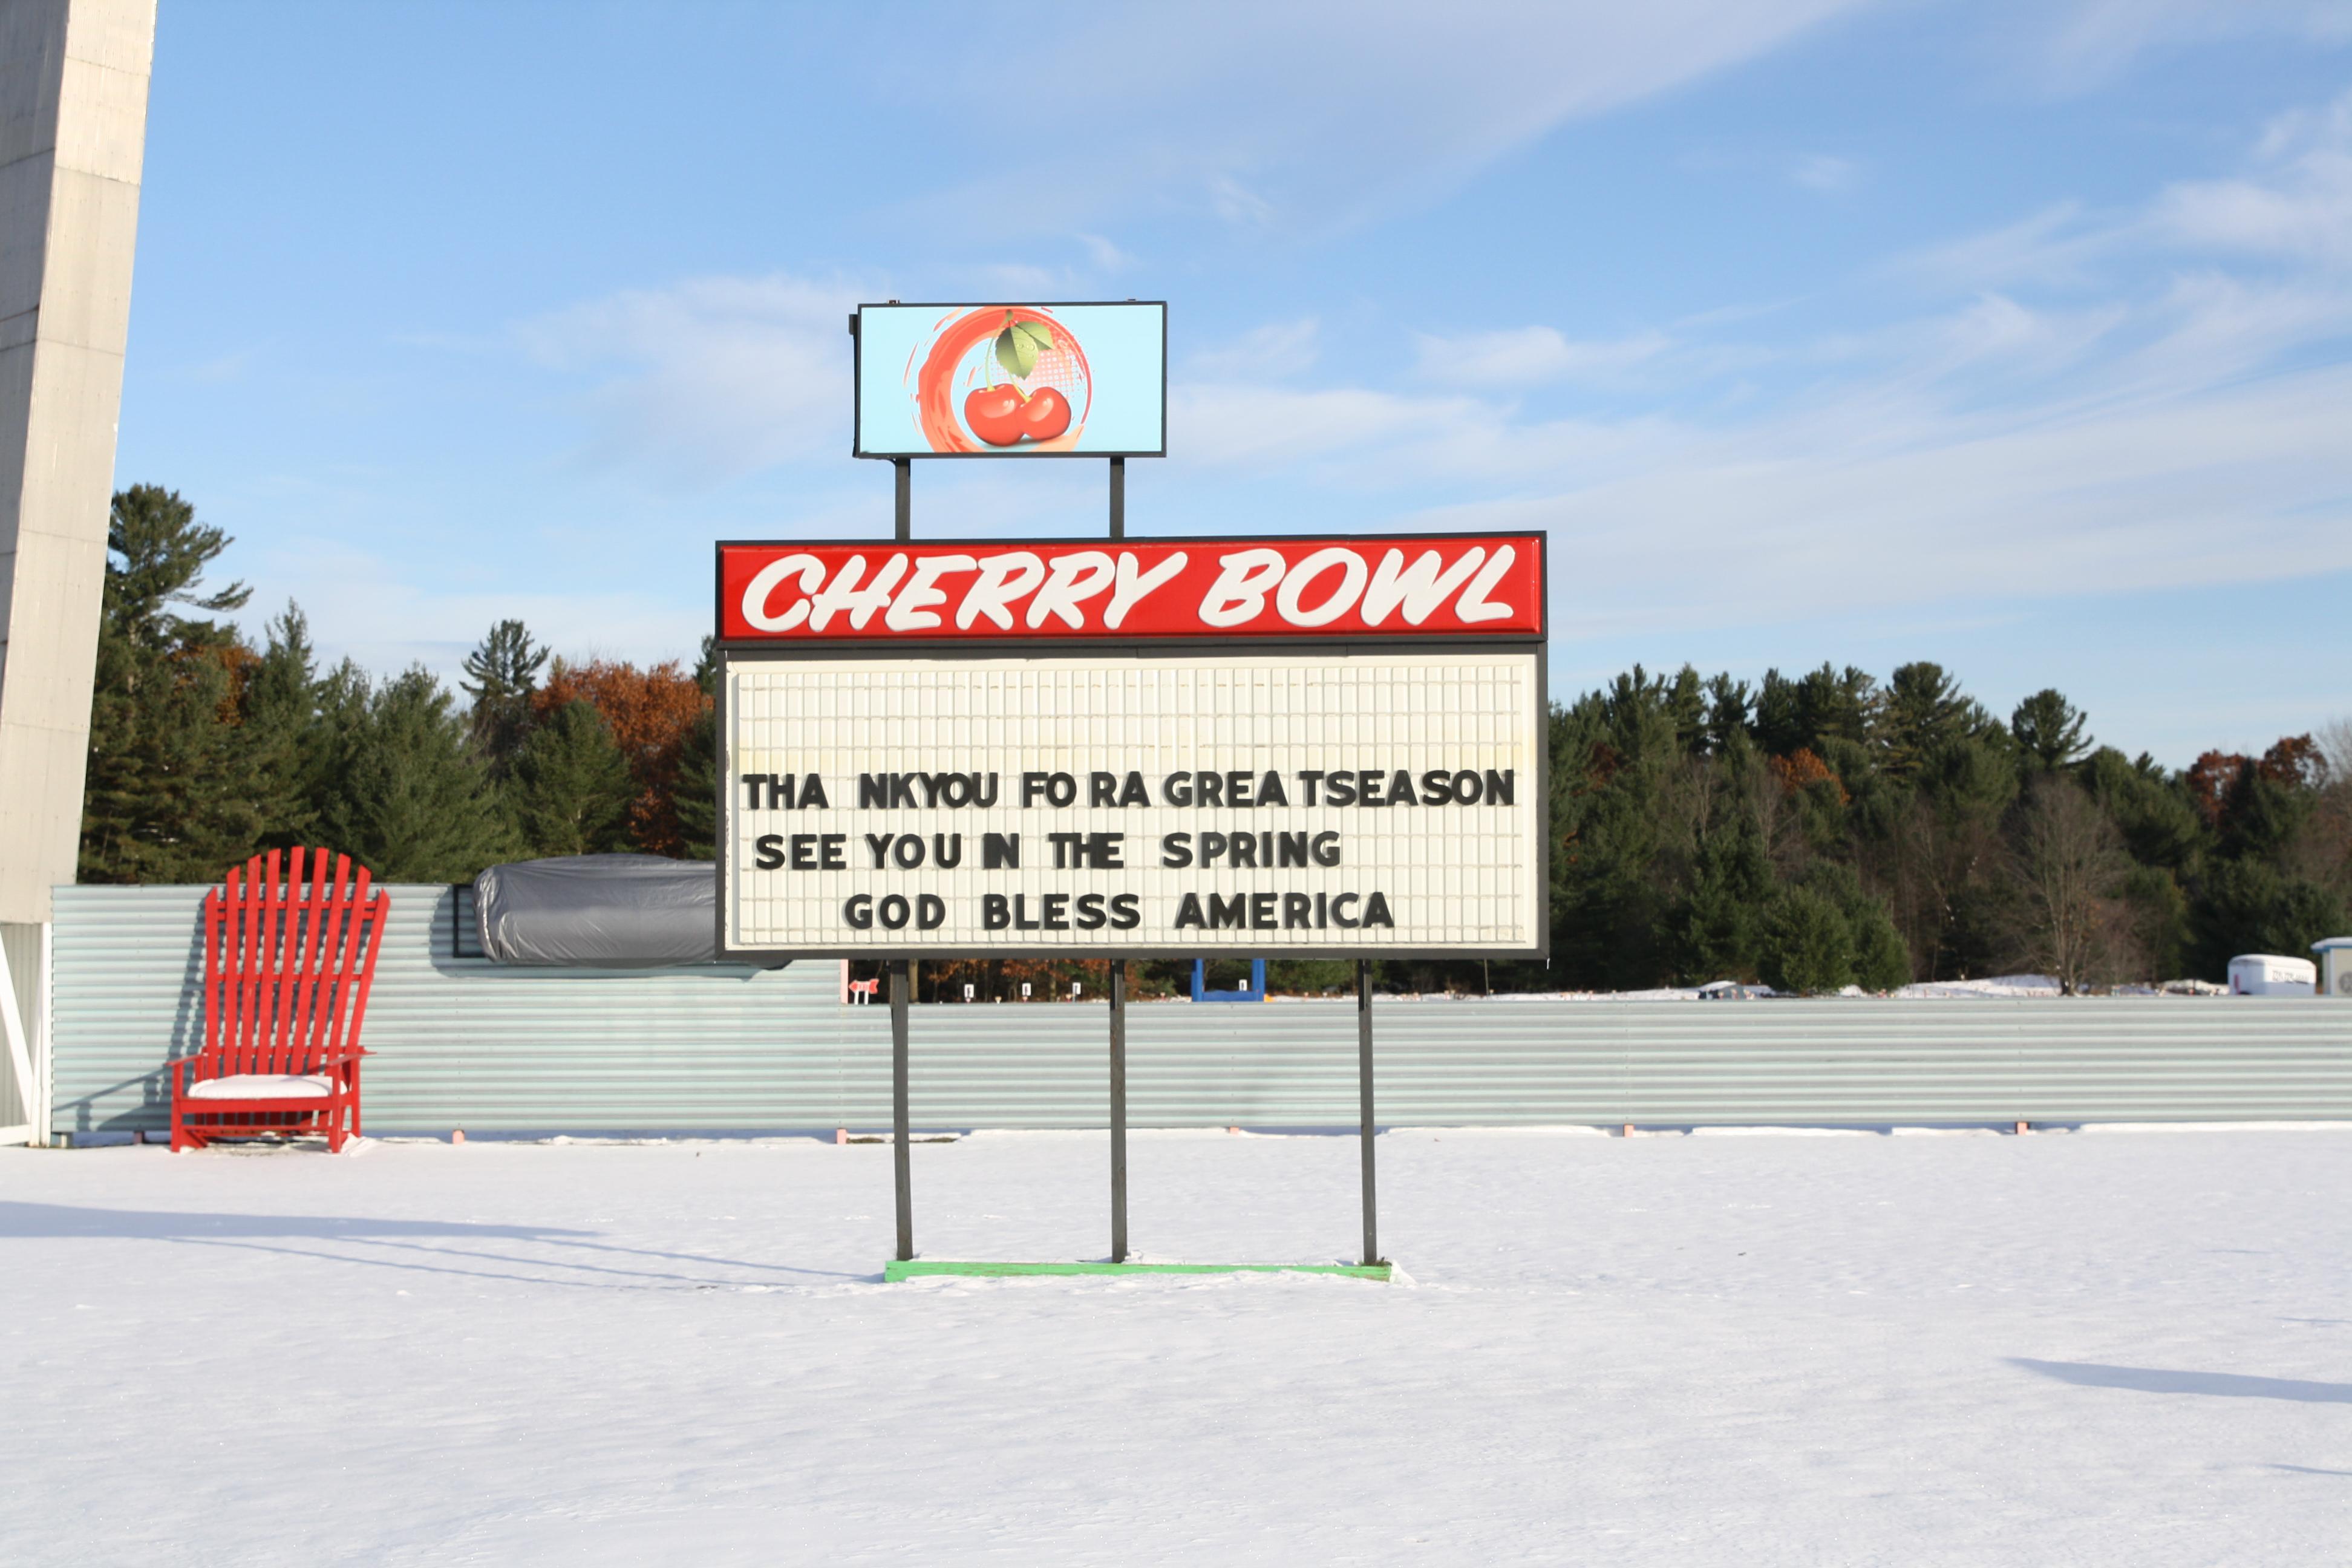 Lake Michigan Cherry Bowl